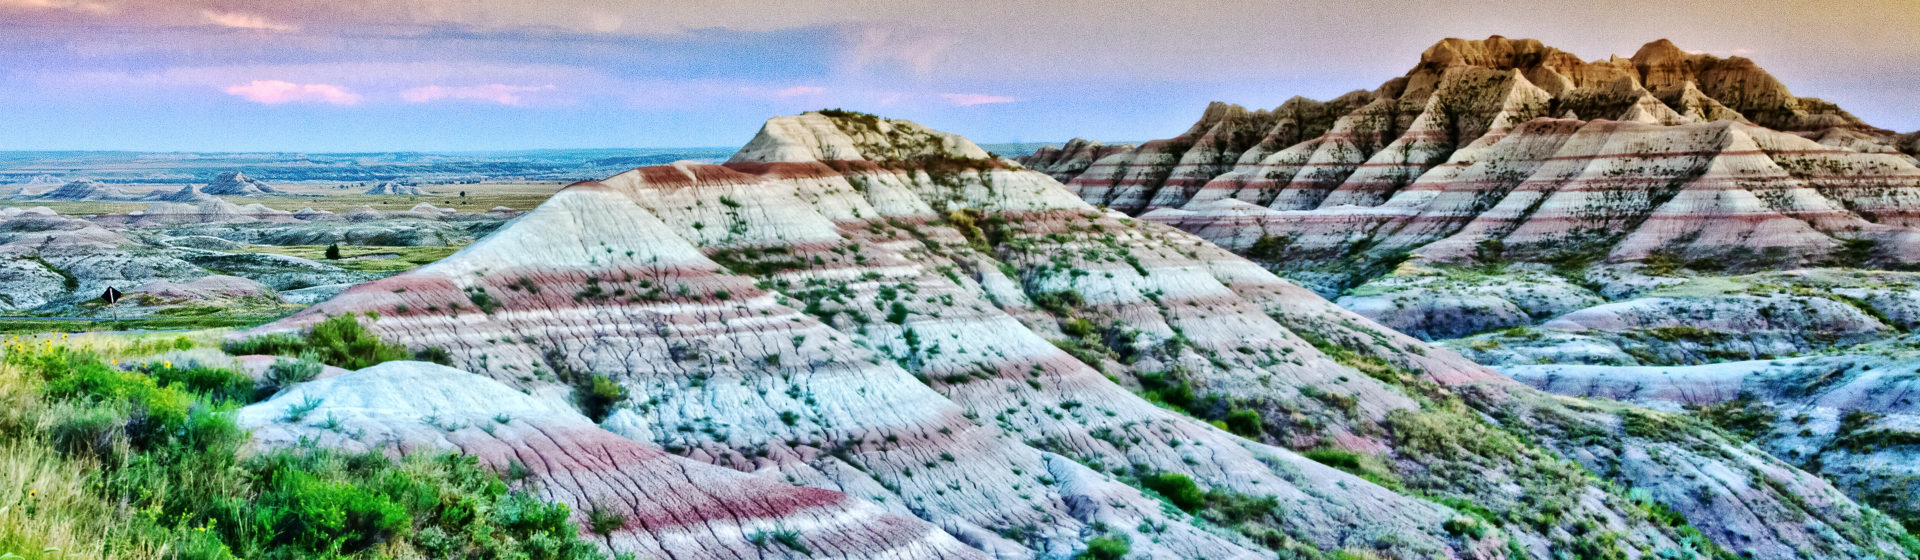 The USA, South Dakota, Badlands National Park, crest